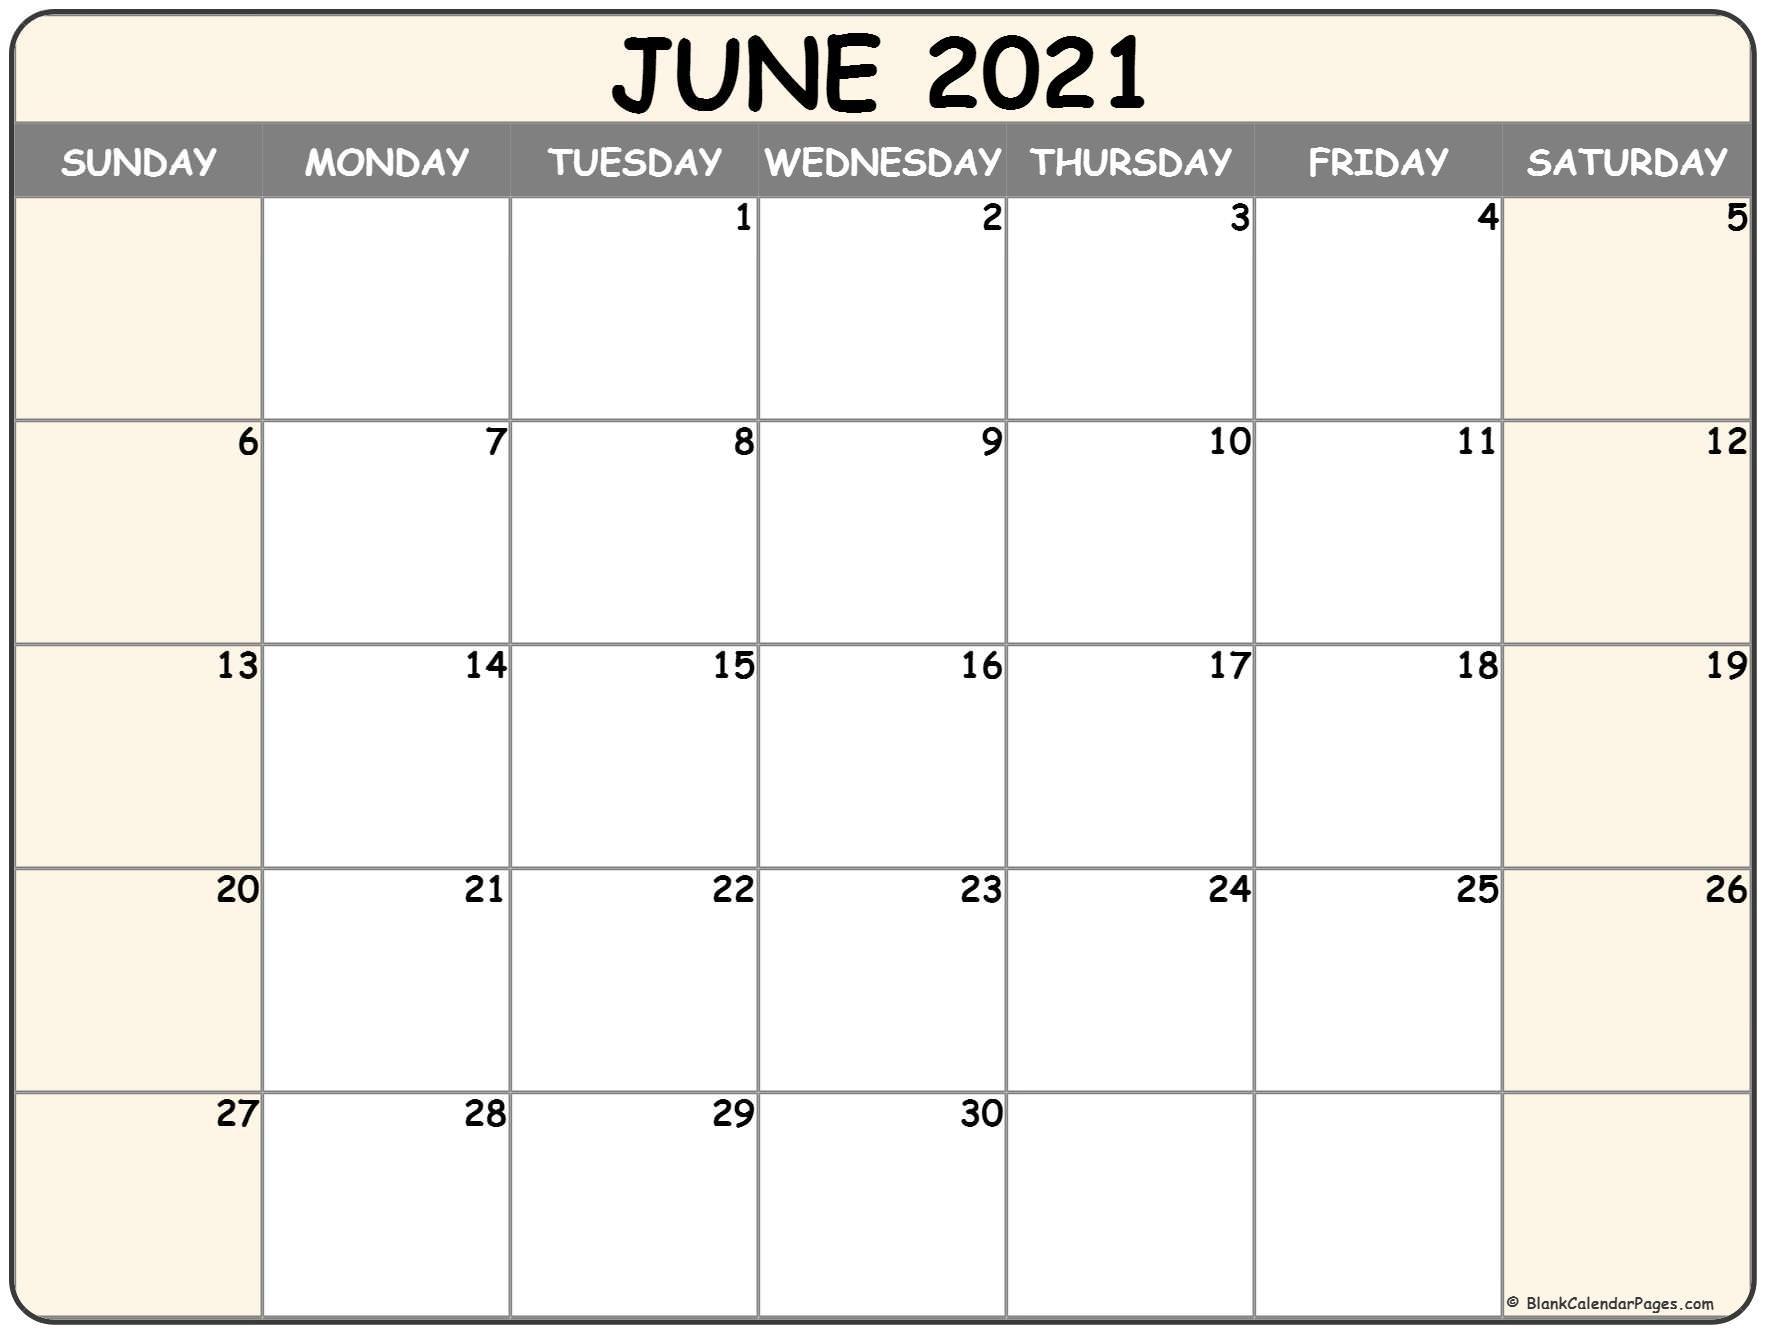 Sepetember 2021 Calendar With Big Numbers   Calendar